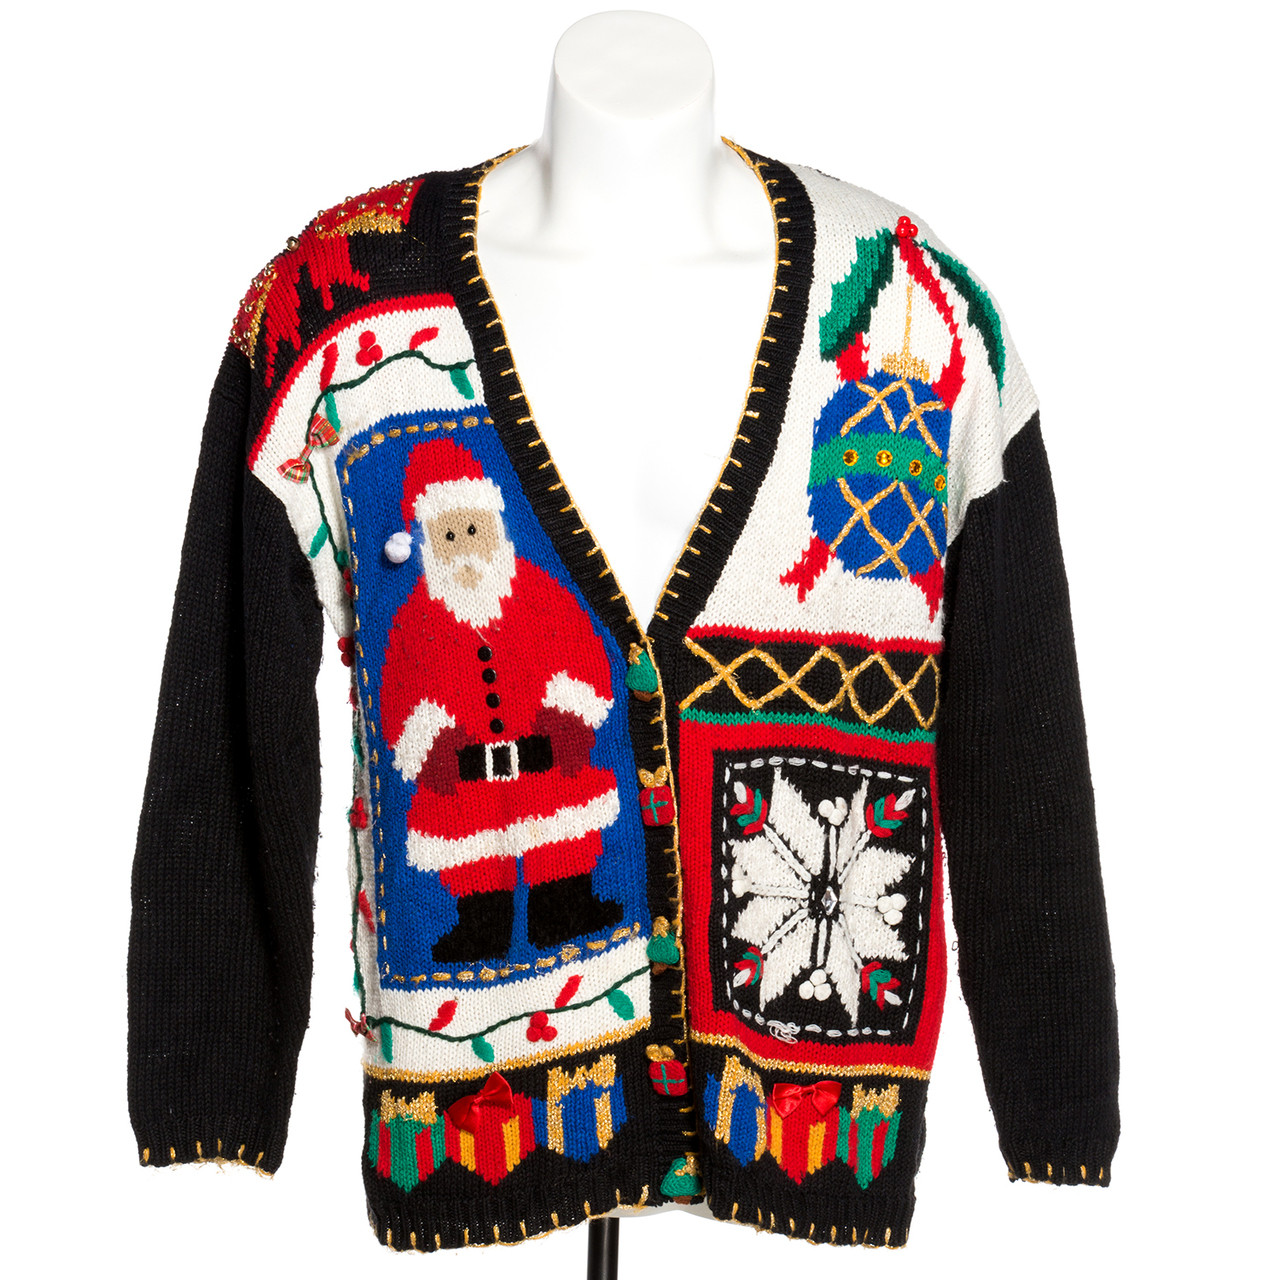 Vintage Christmas Sweaters.Santa Snowflake Vintage Ugly Christmas Cardigan